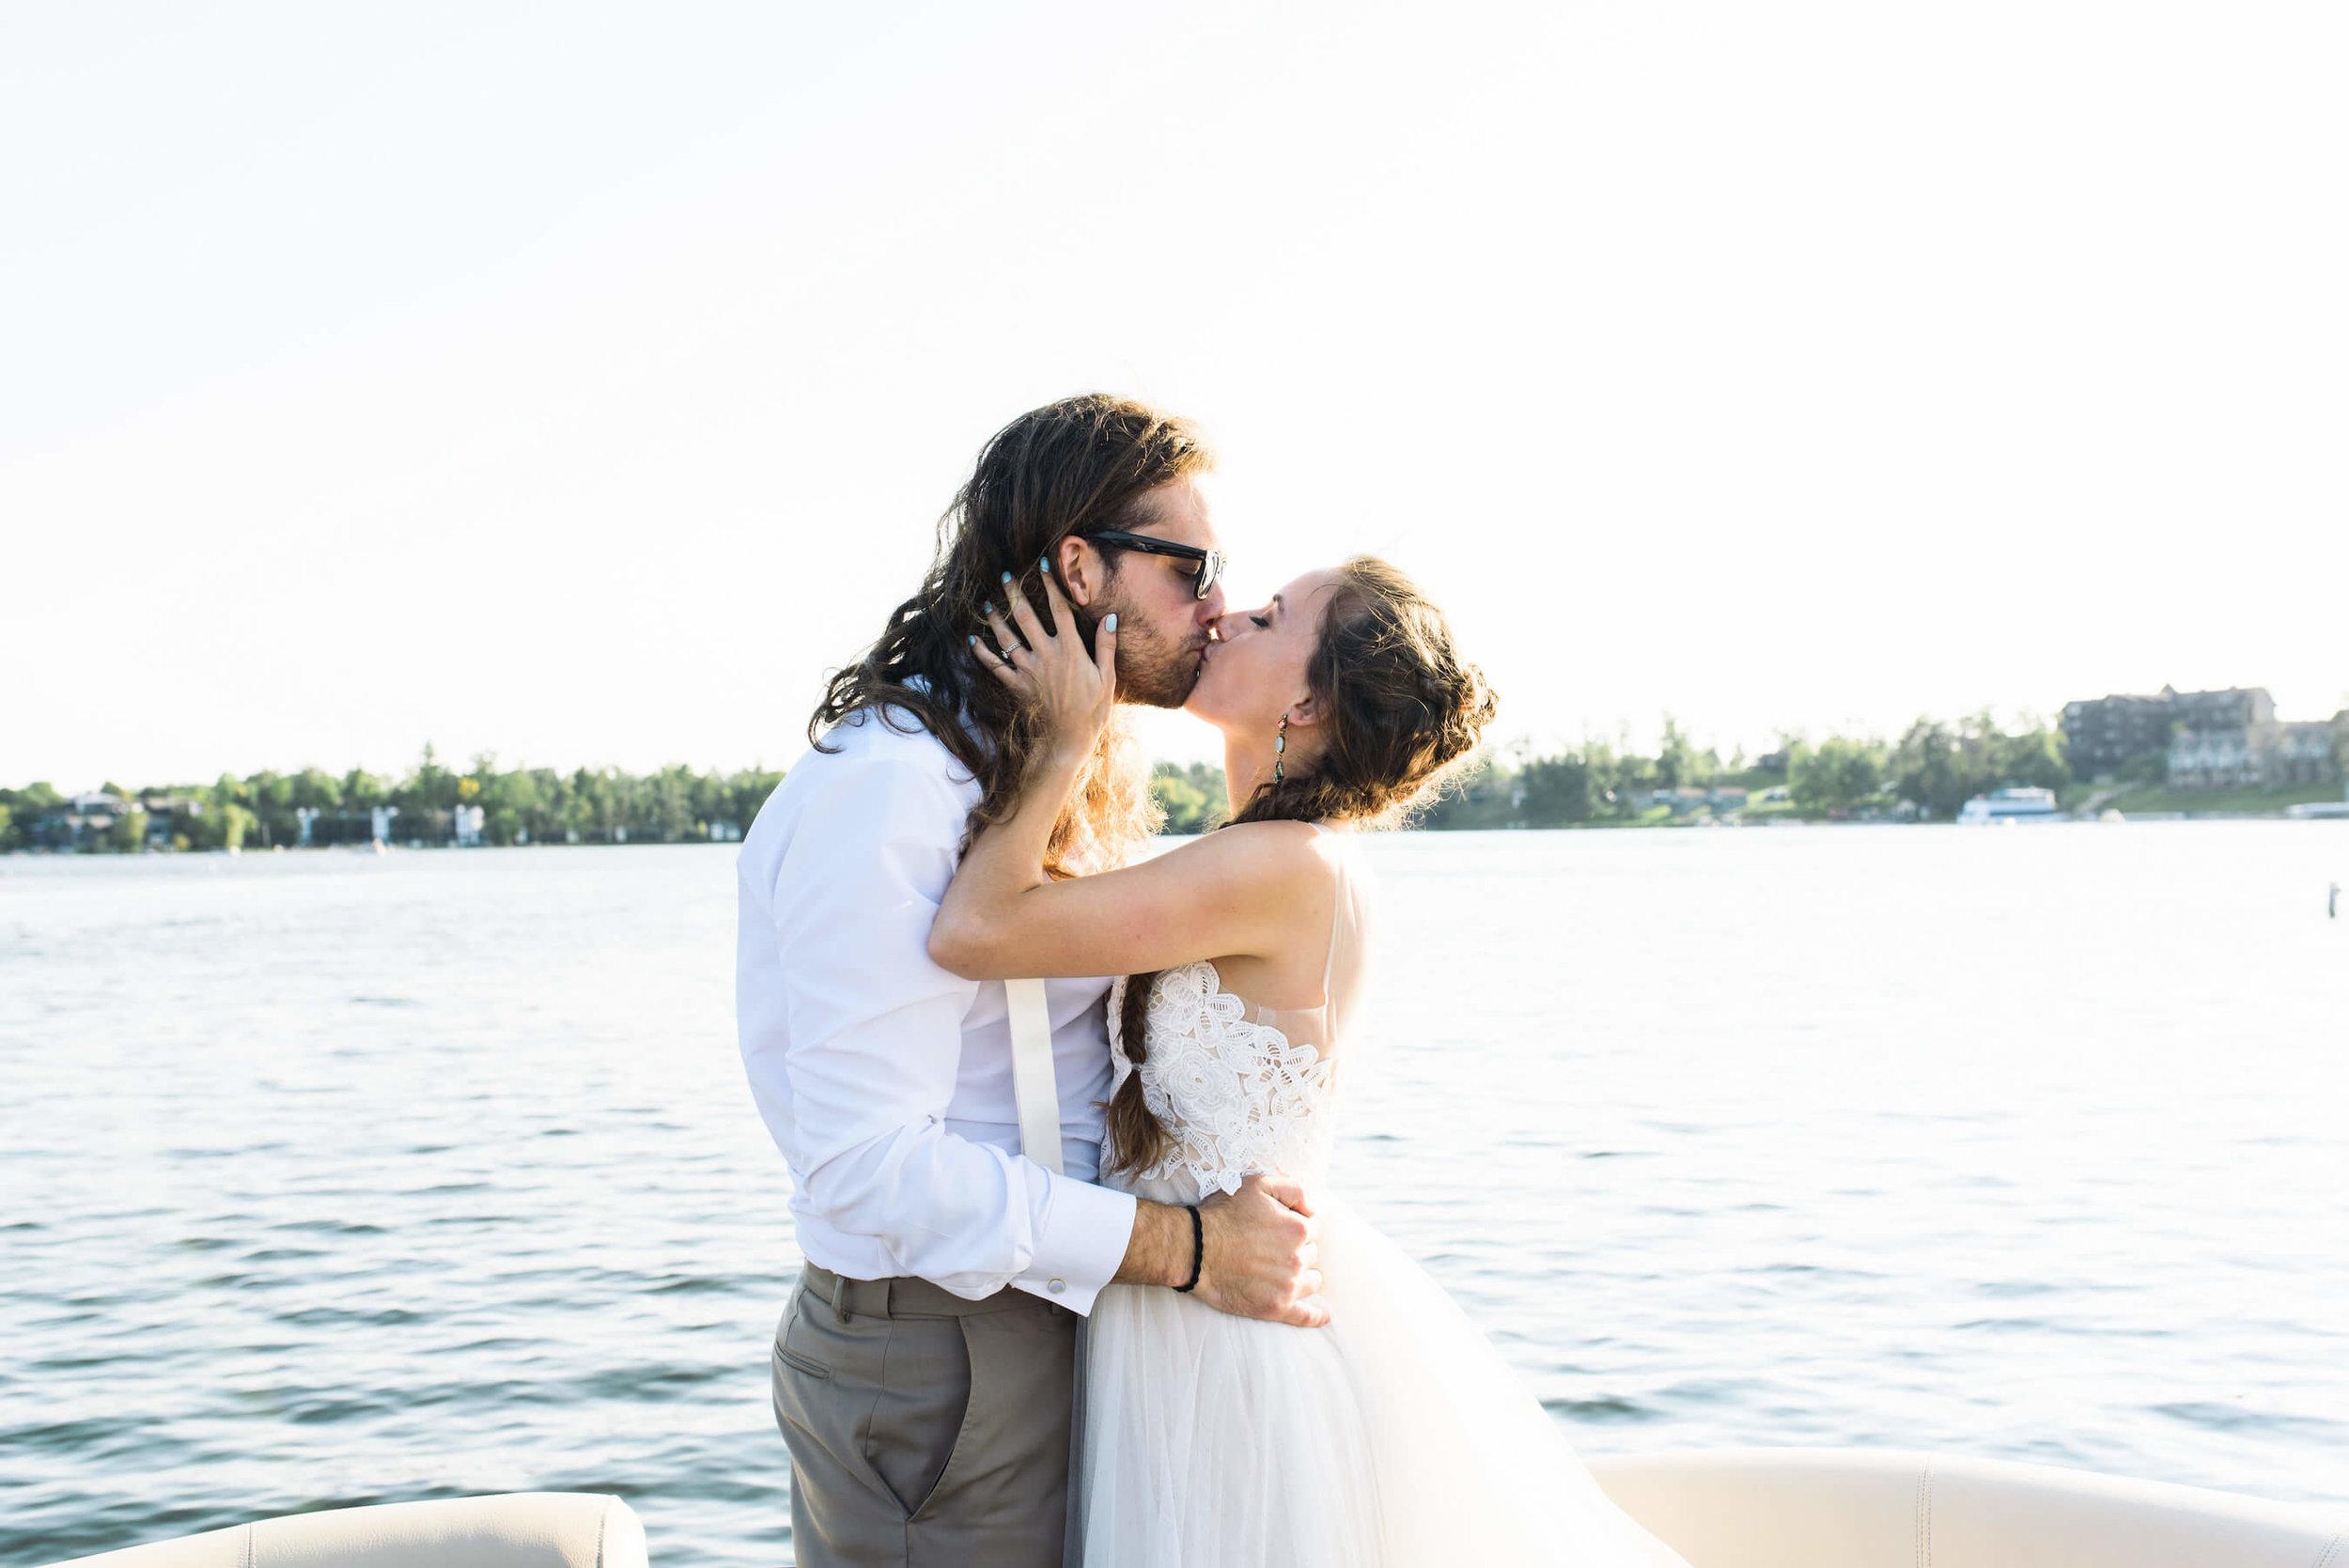 engle-olson-wedding-blair-taylor-32.jpg